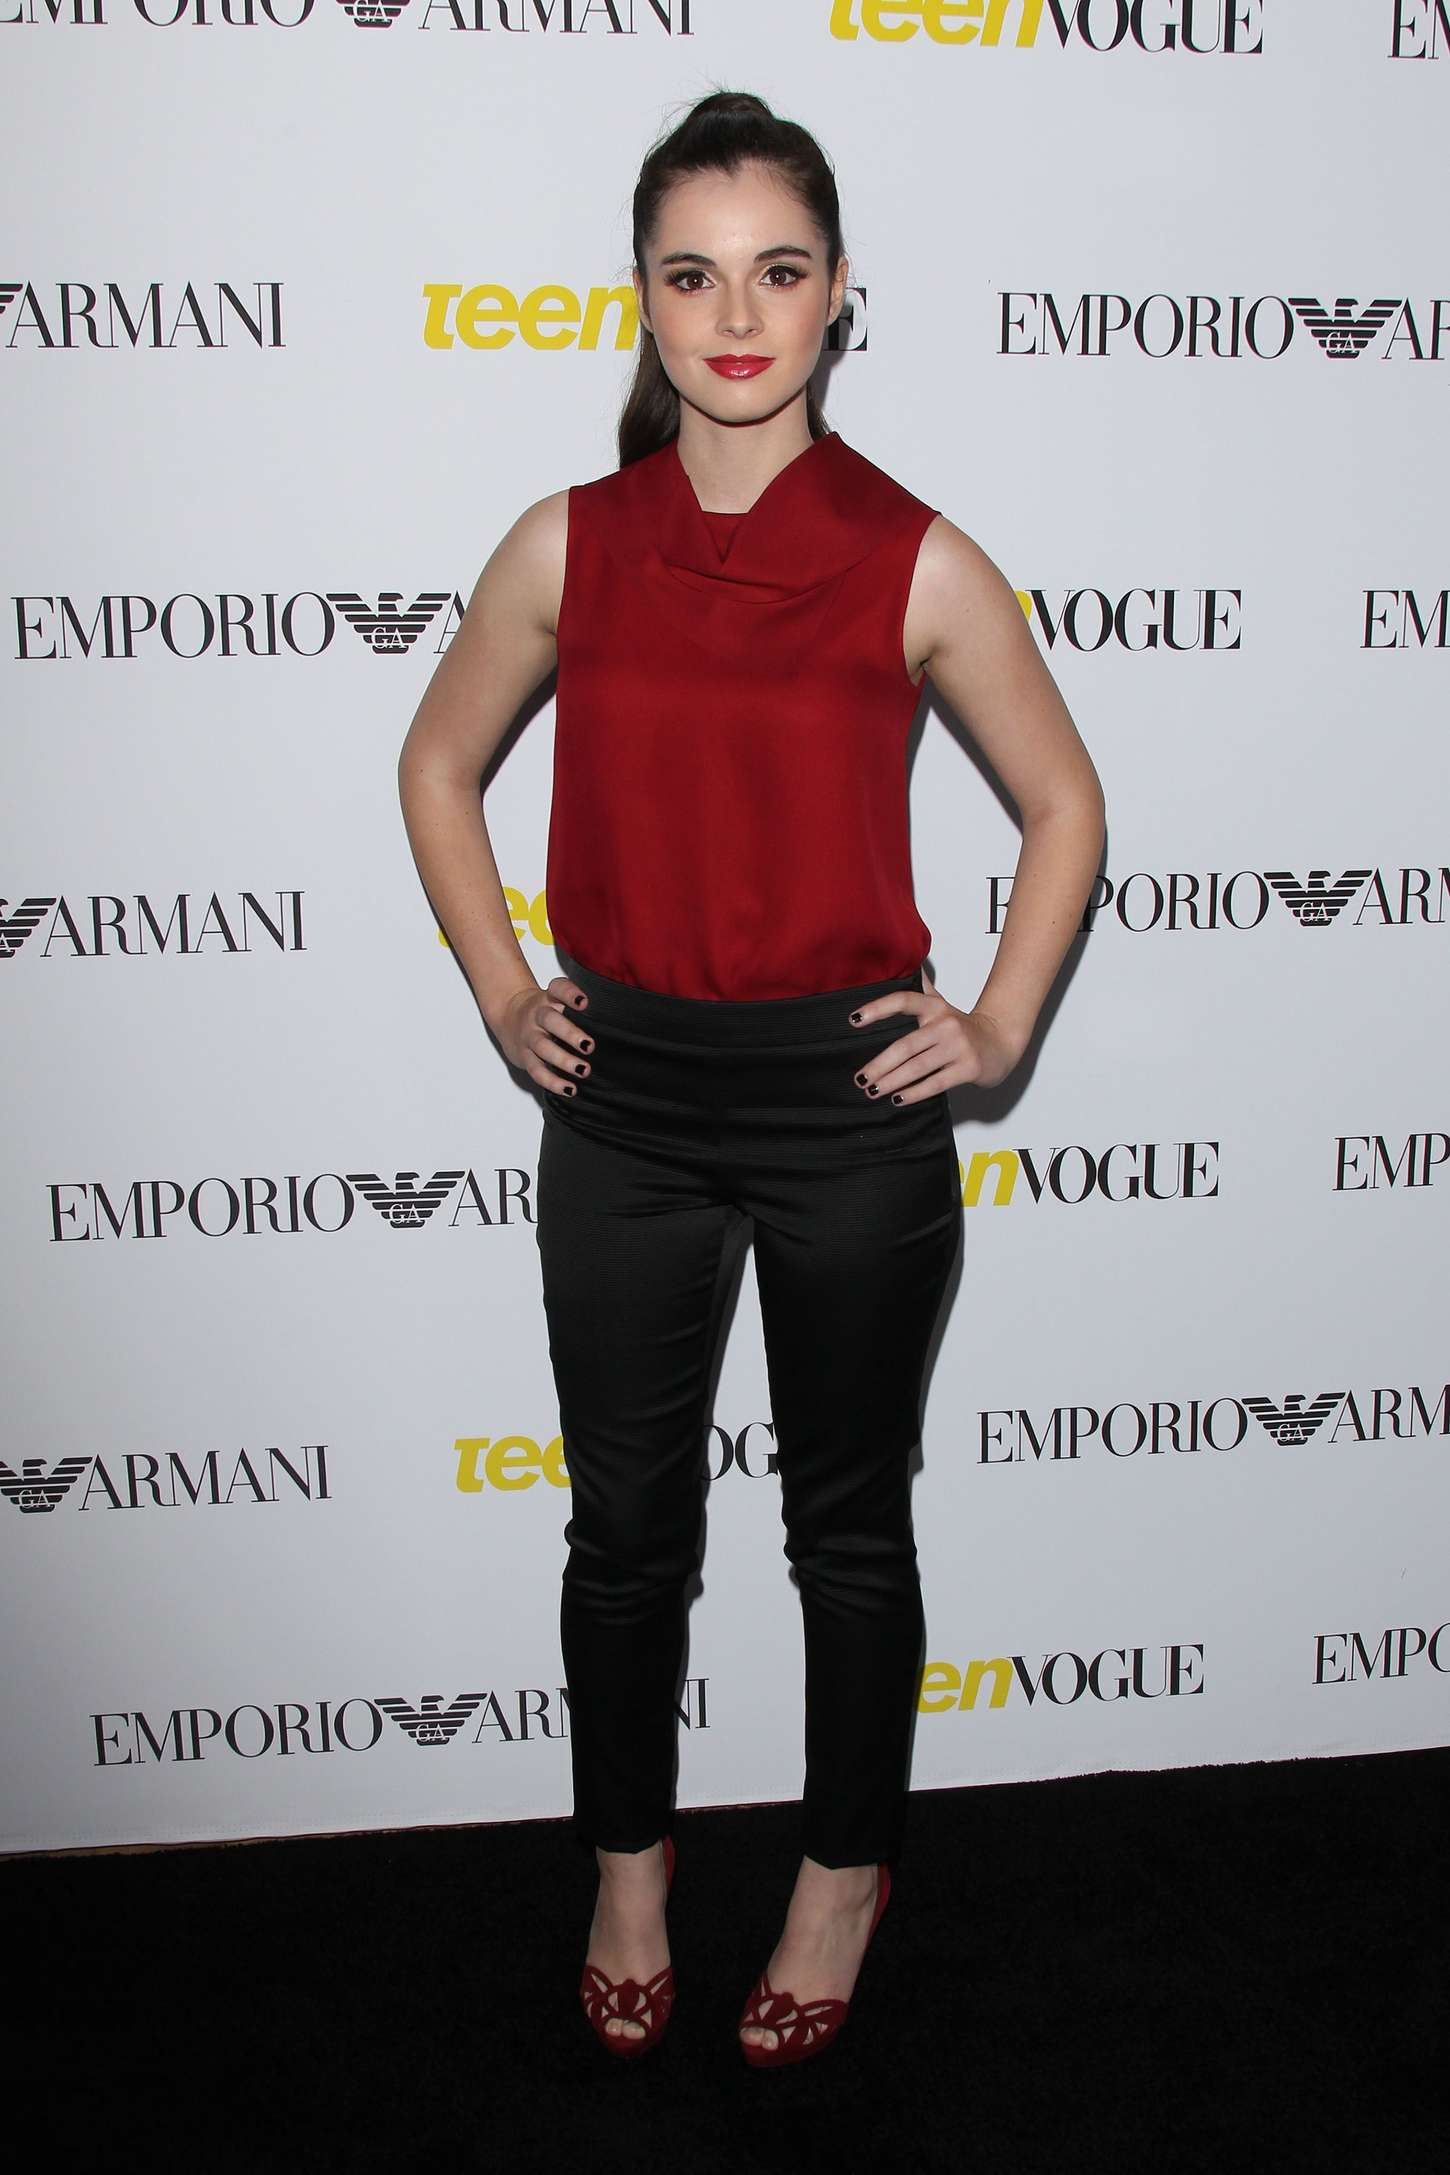 Laura Marano 2015 : Laura Marano: 2015 Teen Vogue Young Hollywood Party -03